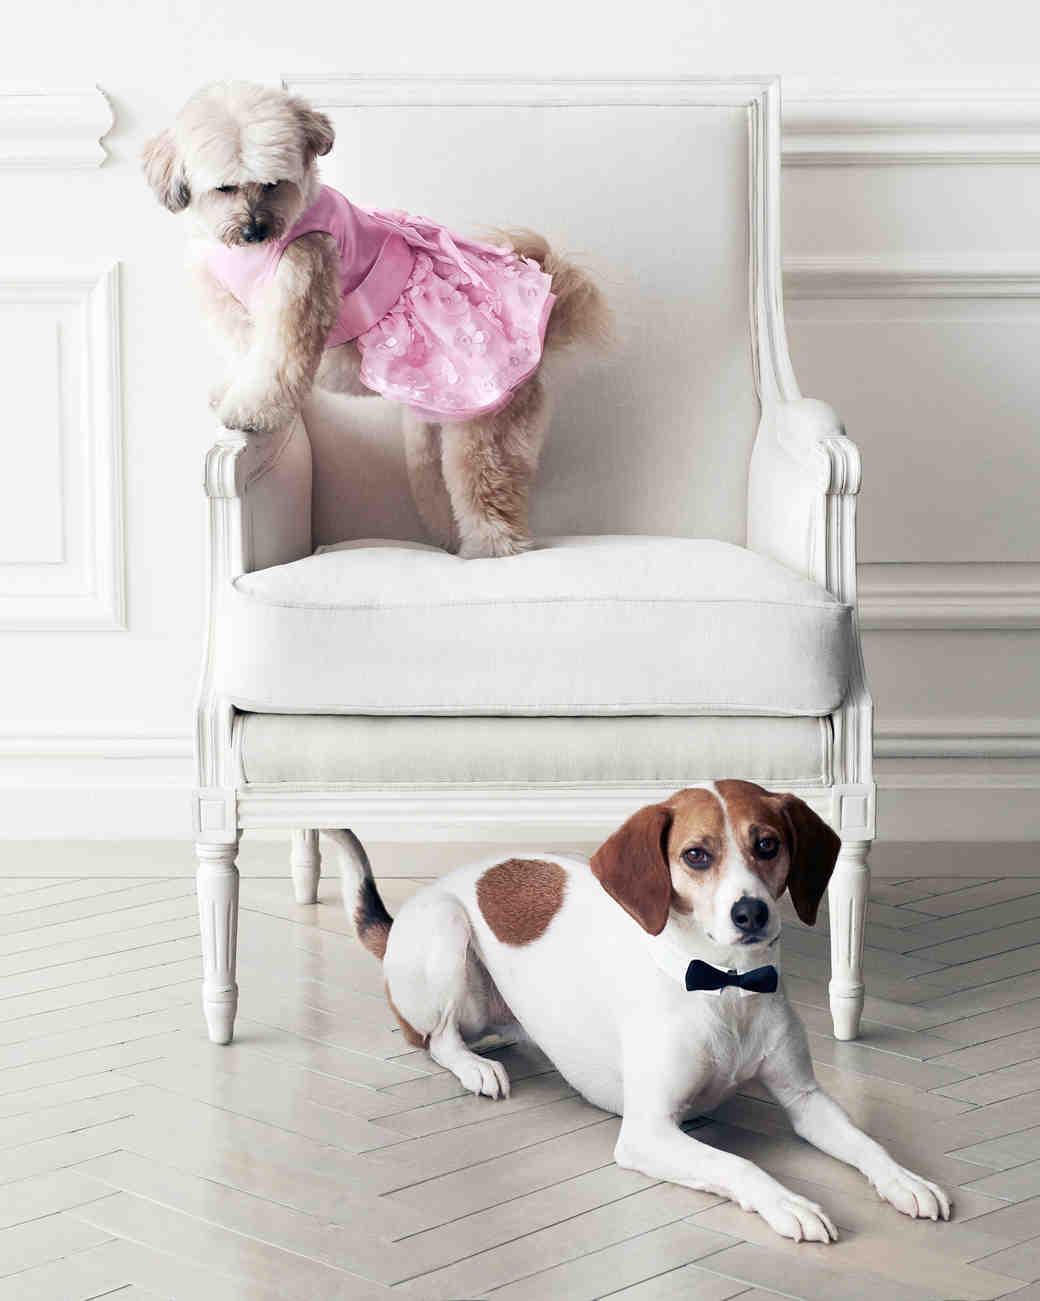 wedding-pet-clothes-dog-on-chair-082-d111997-0515.jpg